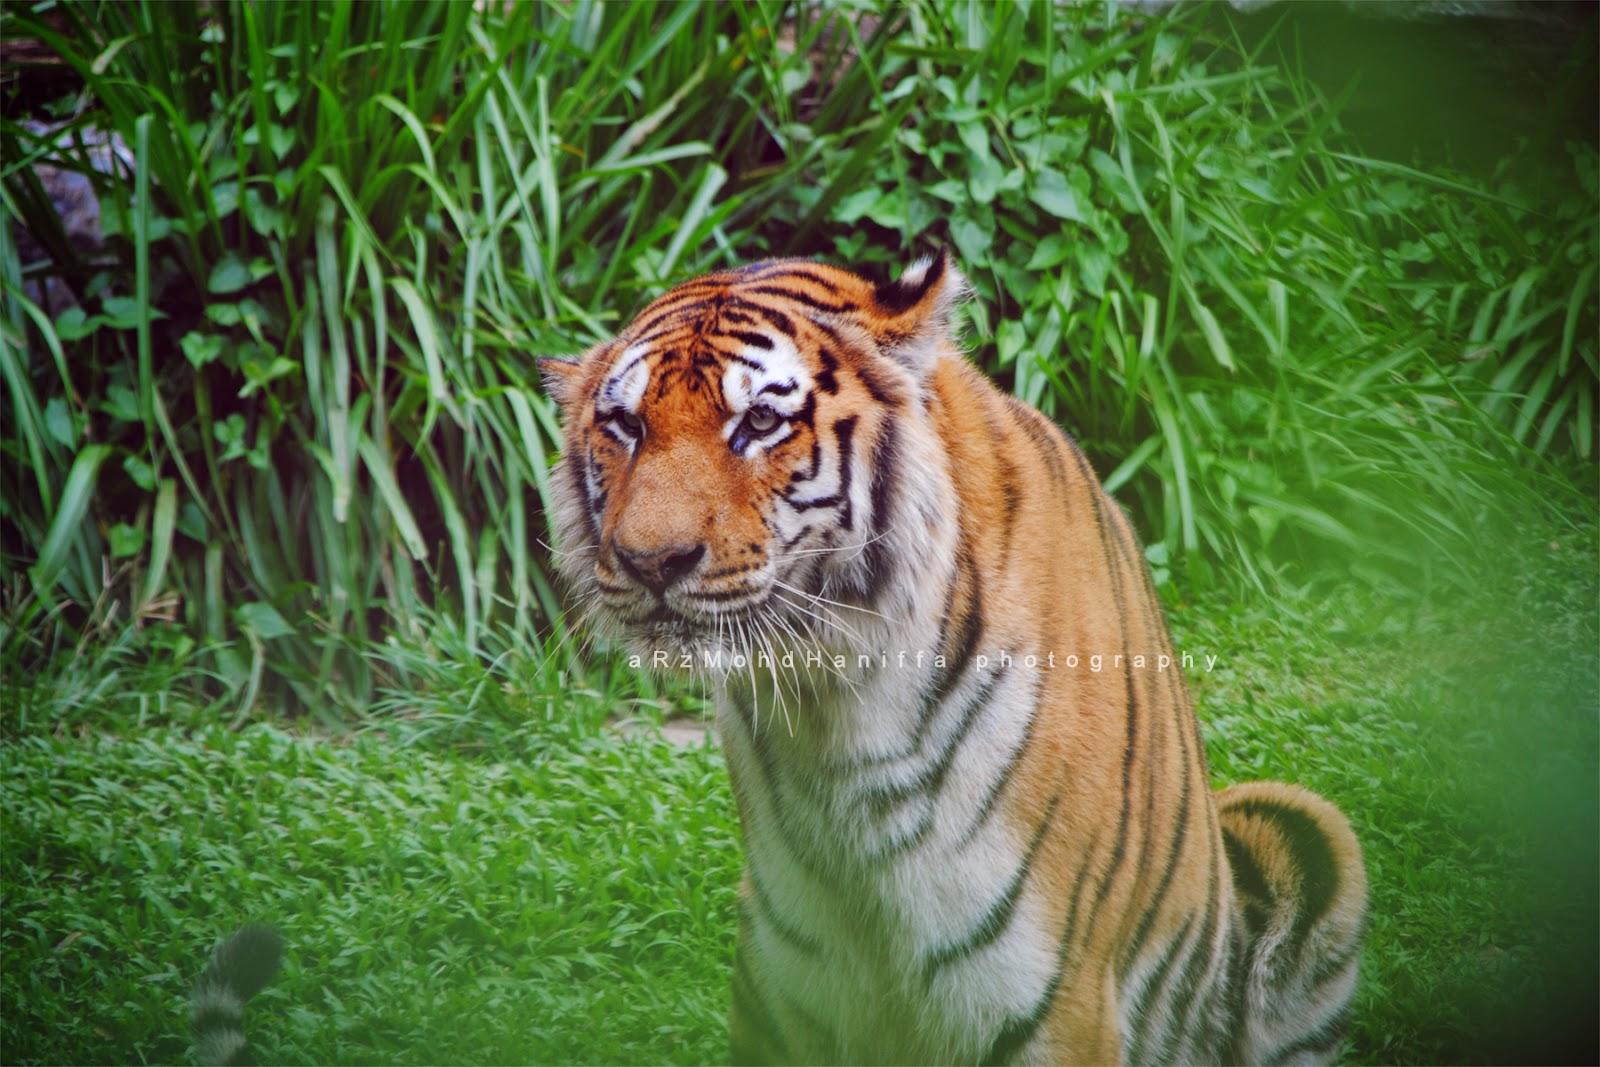 Harimau, tiger, Lost World, gambar cantik, arzmoha, visit malaysia 2014